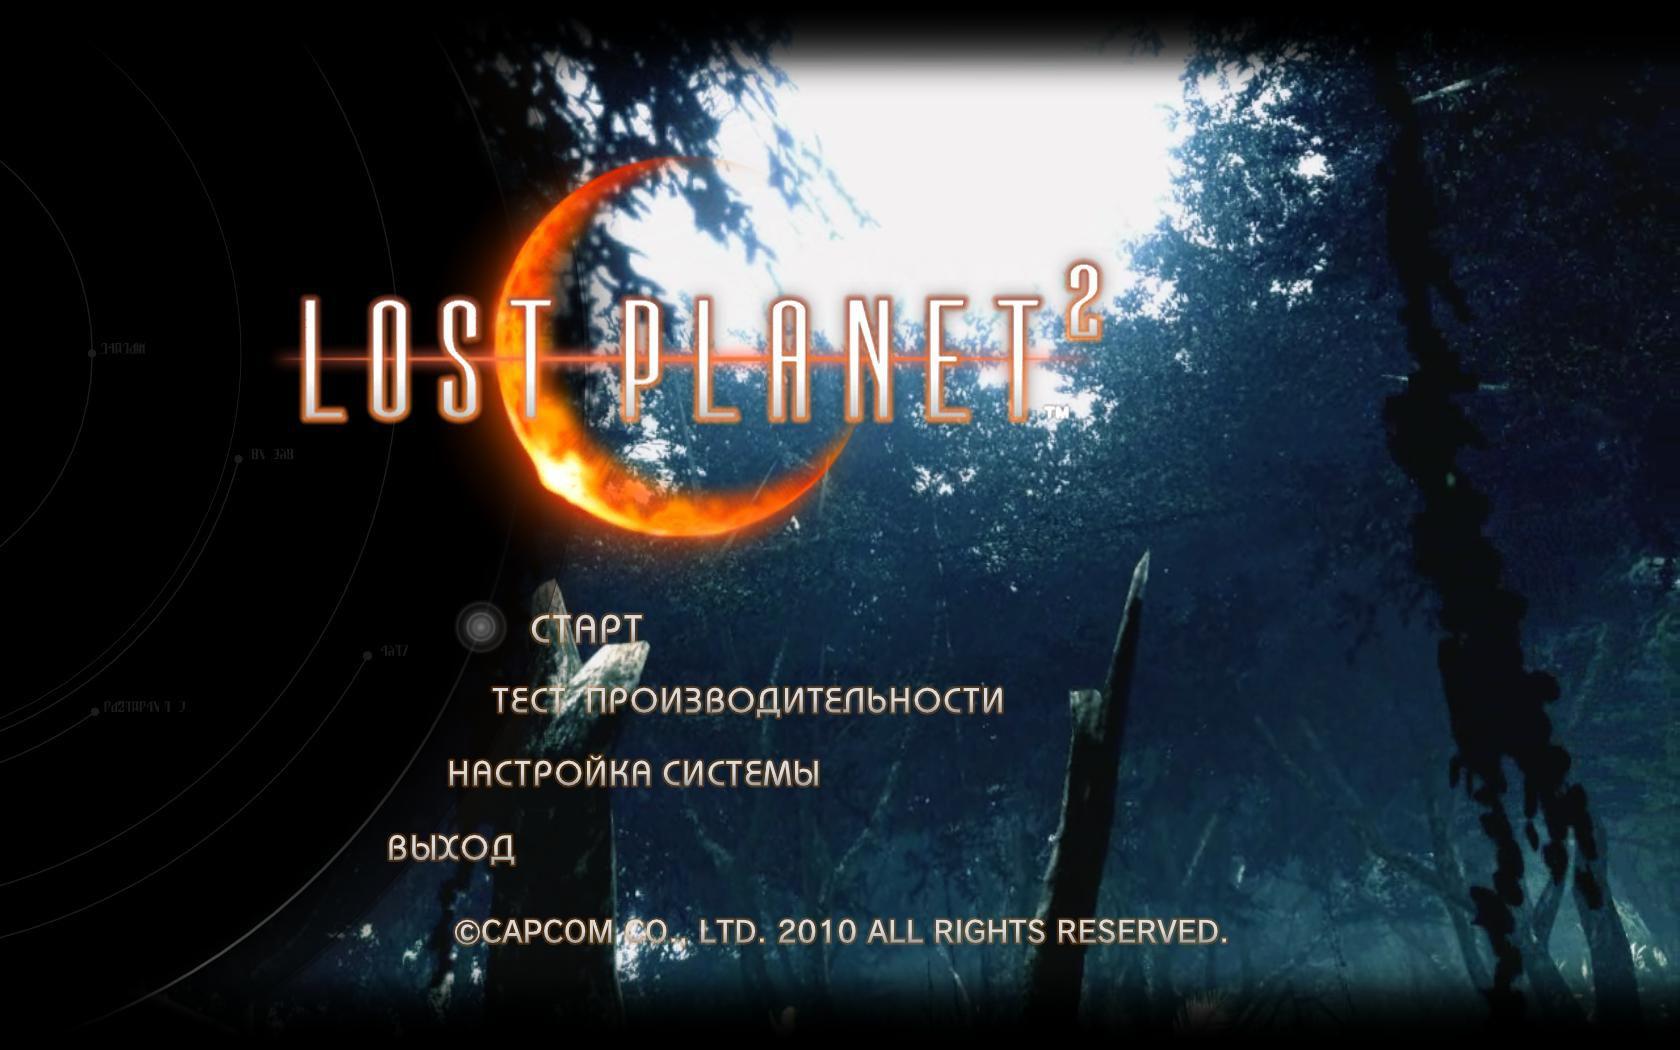 Русская озвучка + текст для Lost Planet 2 (RUS/2010 )